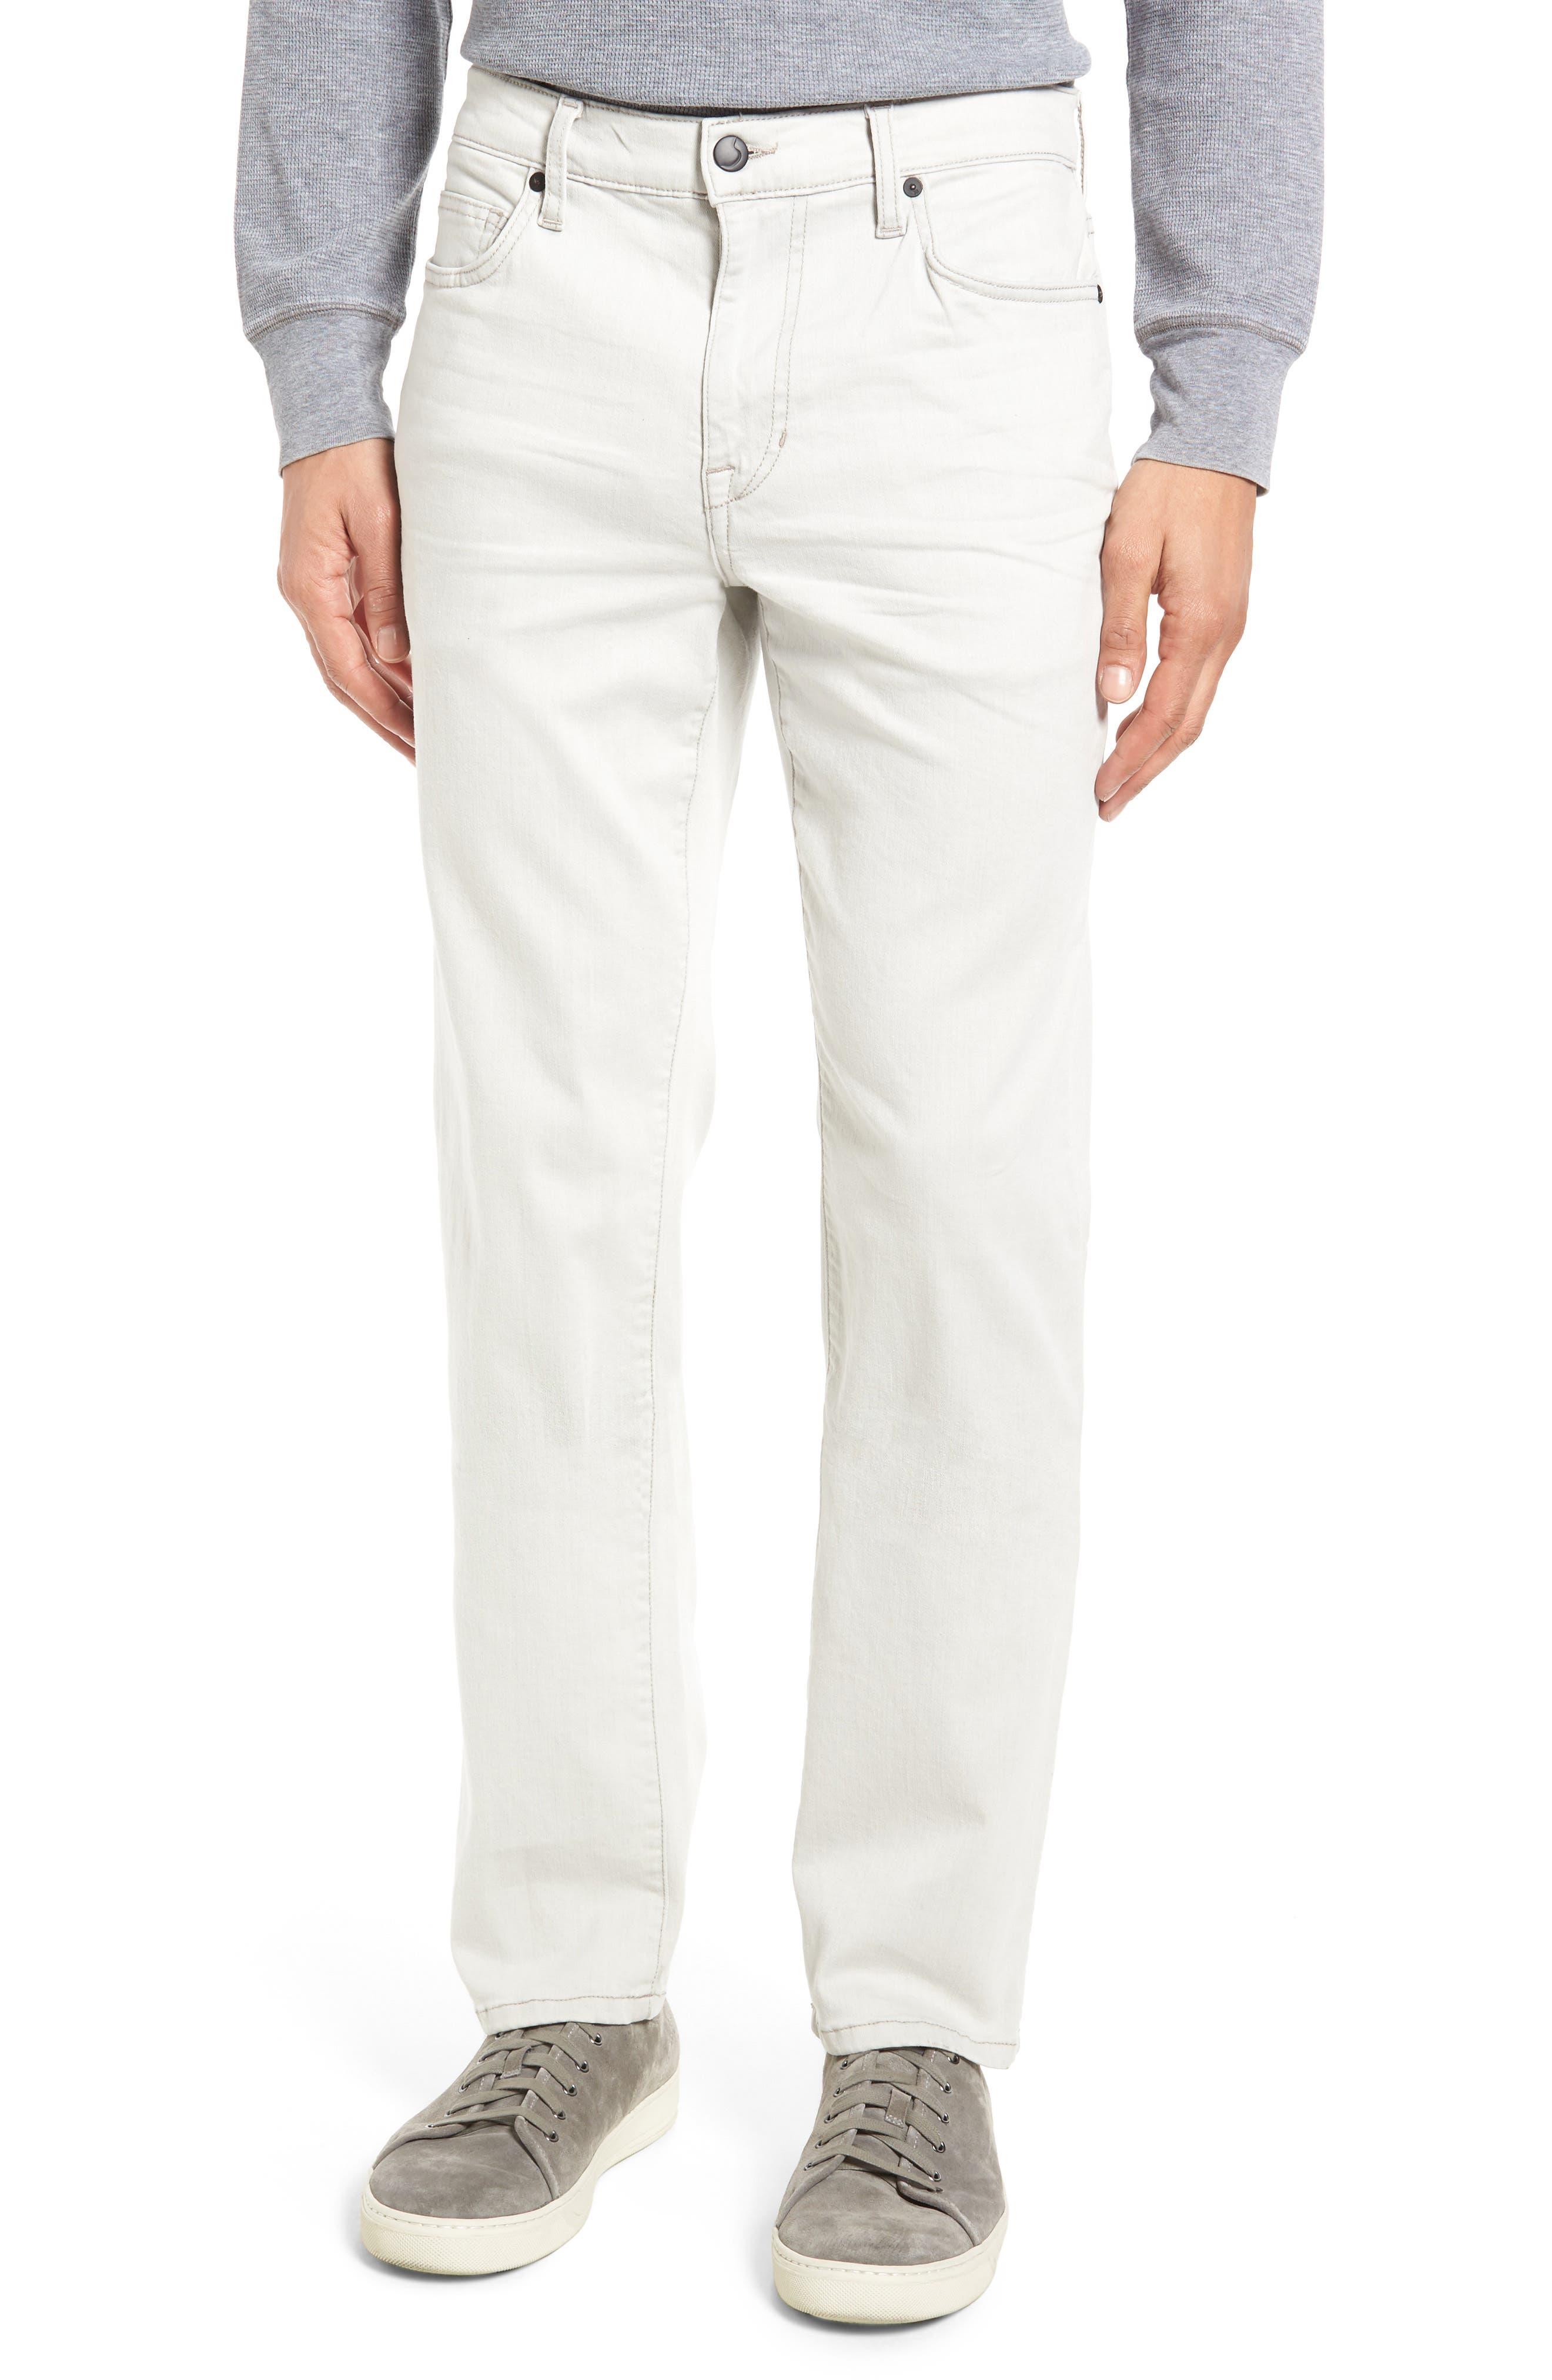 Alternate Image 1 Selected - Joe's Slim Fit Jeans (Bryson)